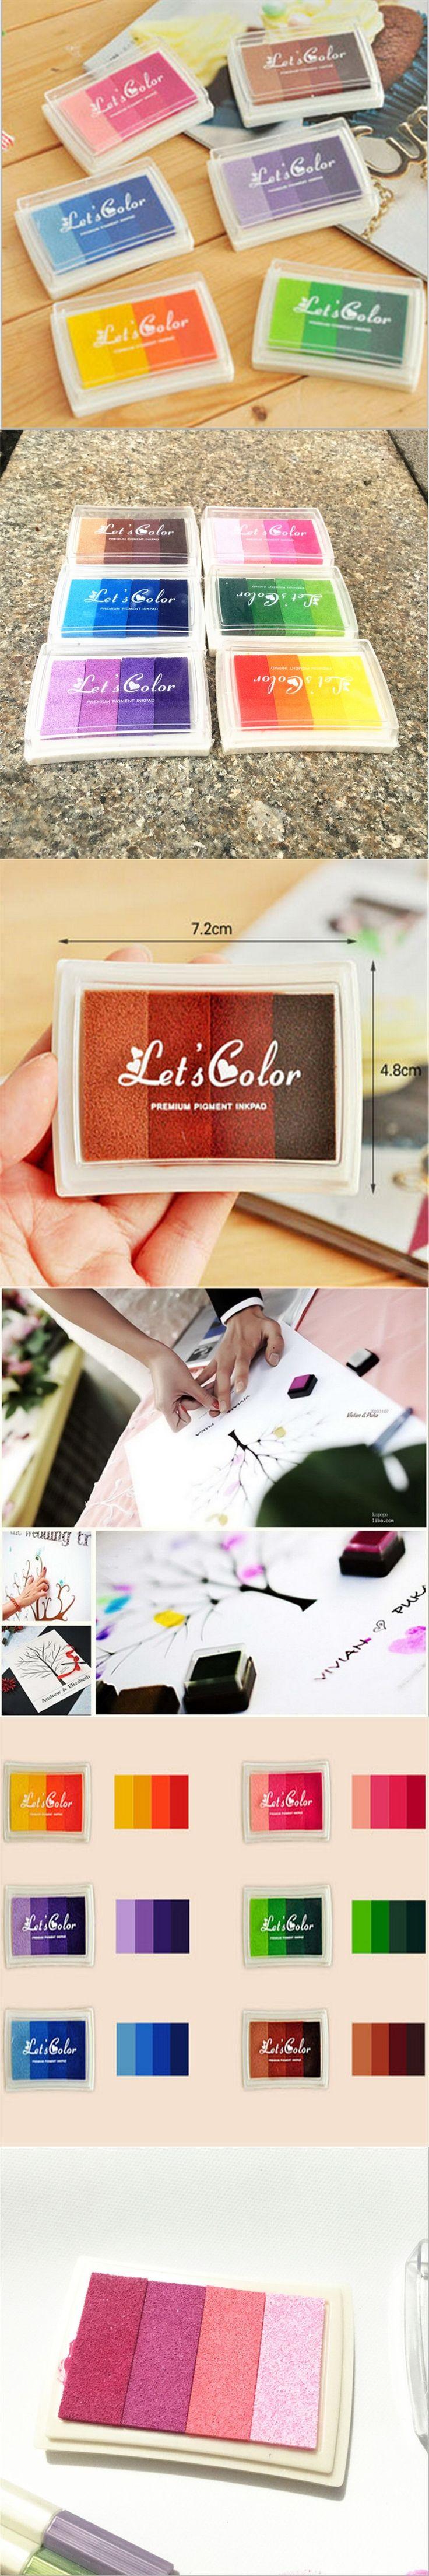 Hot 6pcs/lot Gradient Color Ink Pad DIY Scrapbooking Vintage Crafts Ink Pad Colorful Inkpad Stamps Sealing Decoration Stamp-B